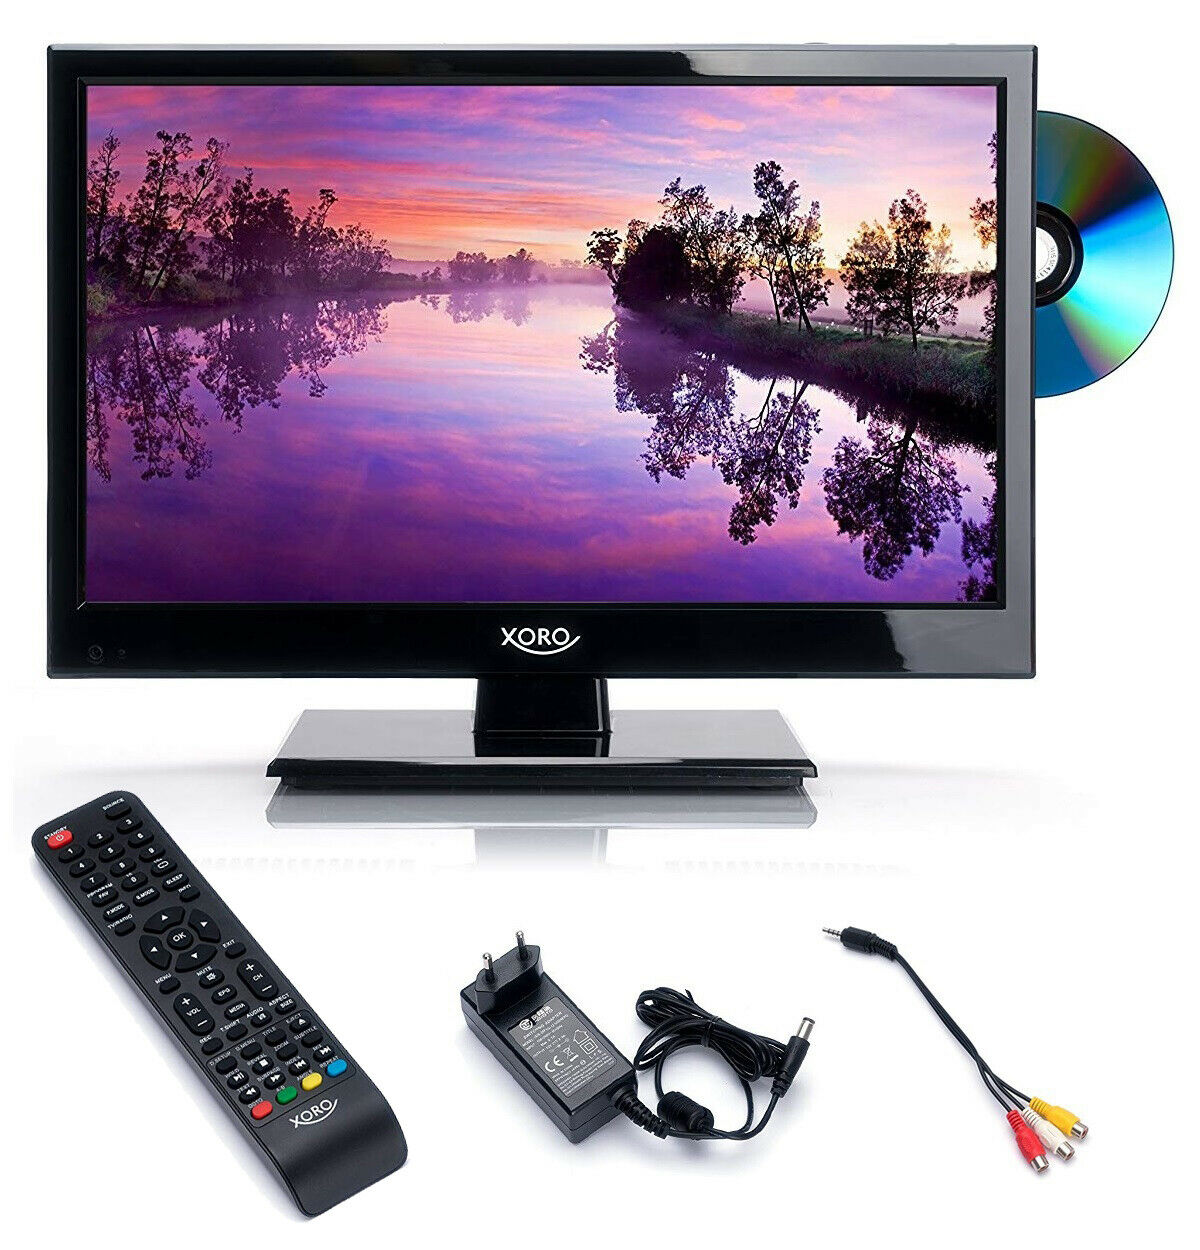 Wohnmobil Camping Fernseher LED TV mit DVD 15 Zoll LCD DVB S2 T2 C 12 V 230 Volt